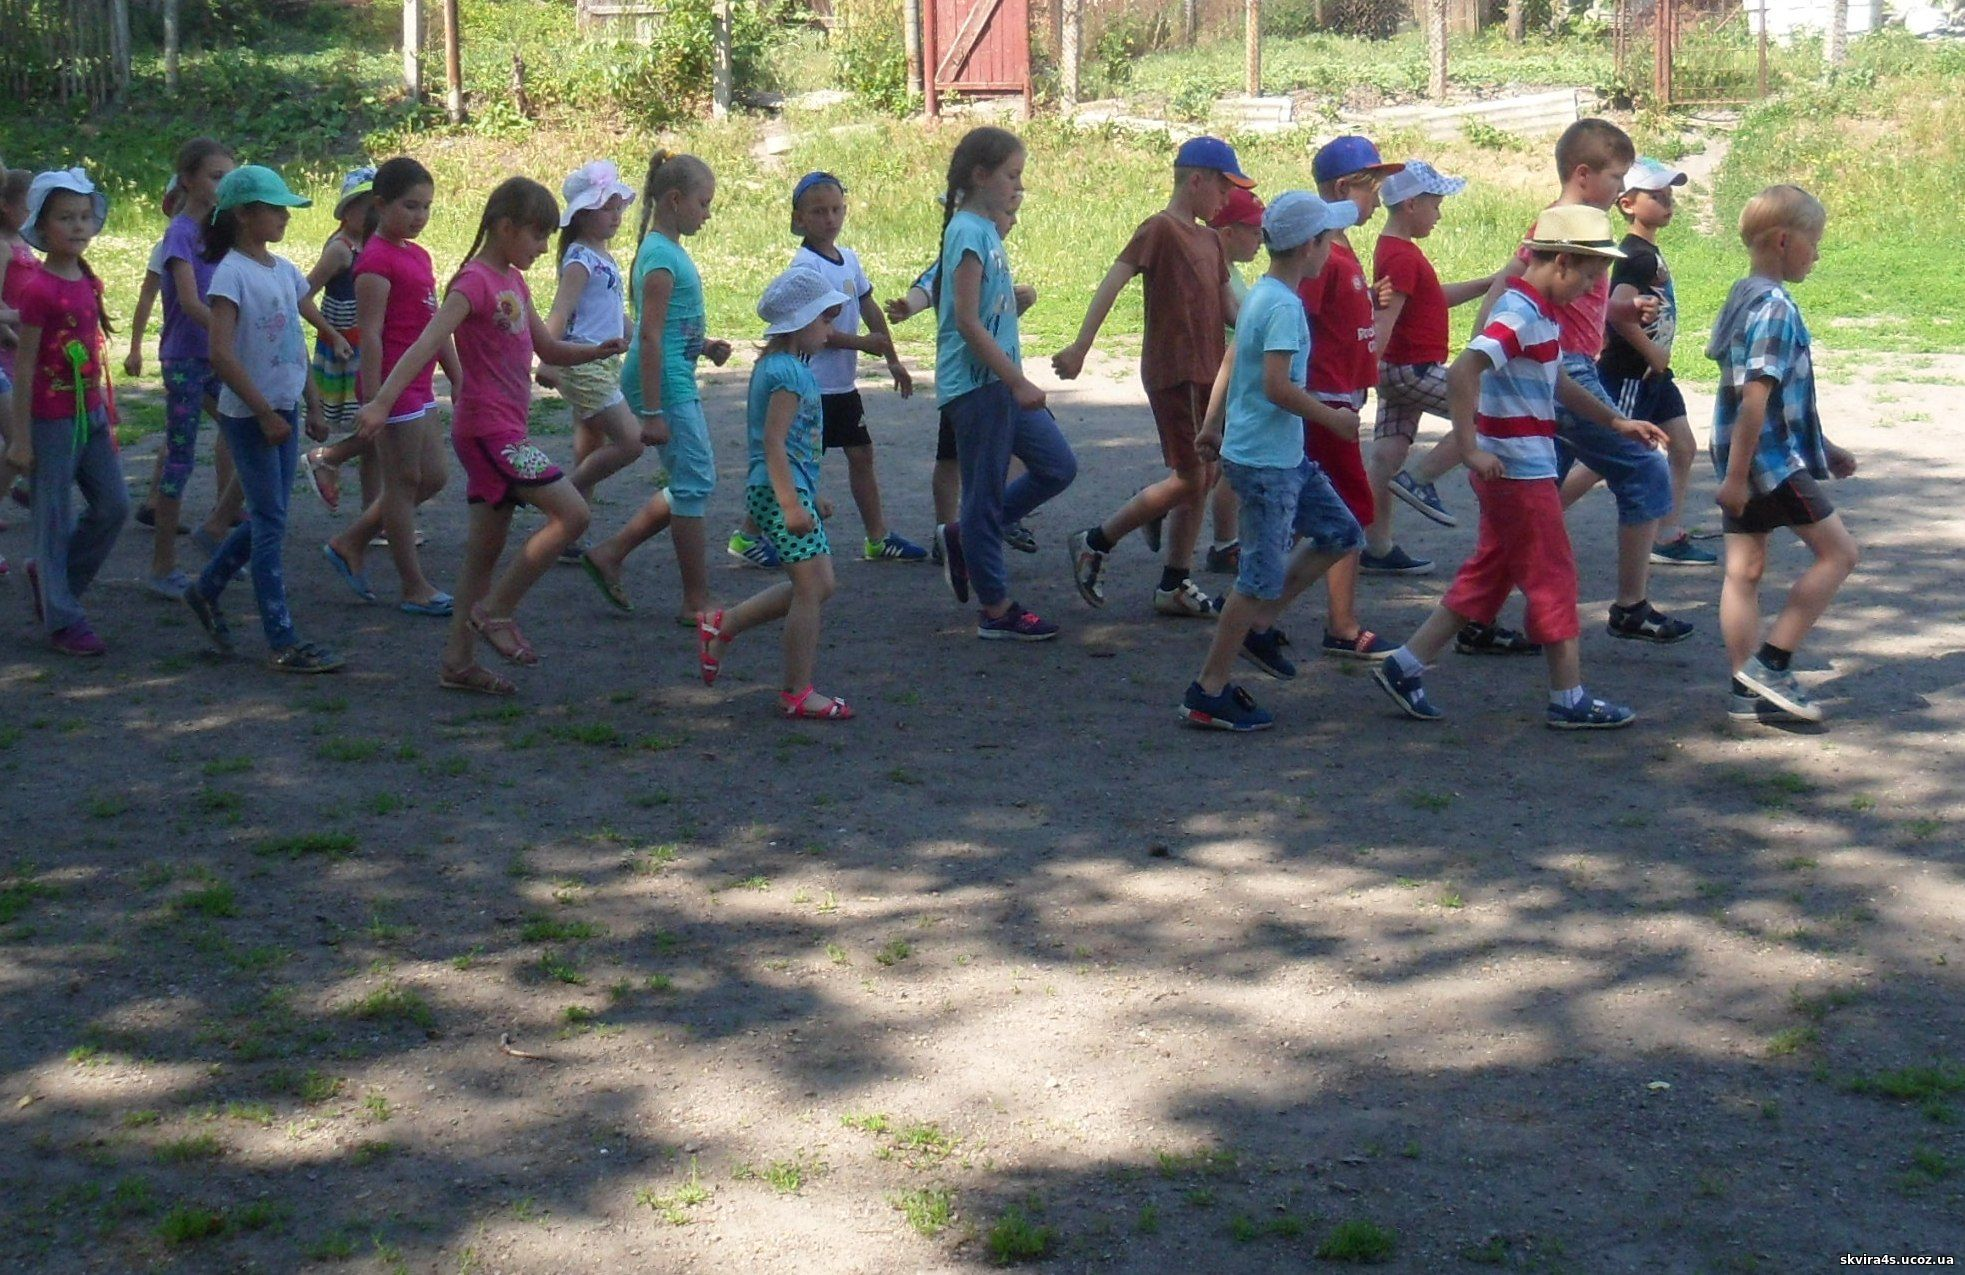 http://skvira4s.ucoz.ua/foto/tabir-17/07-06-1/SAM_5786.jpg